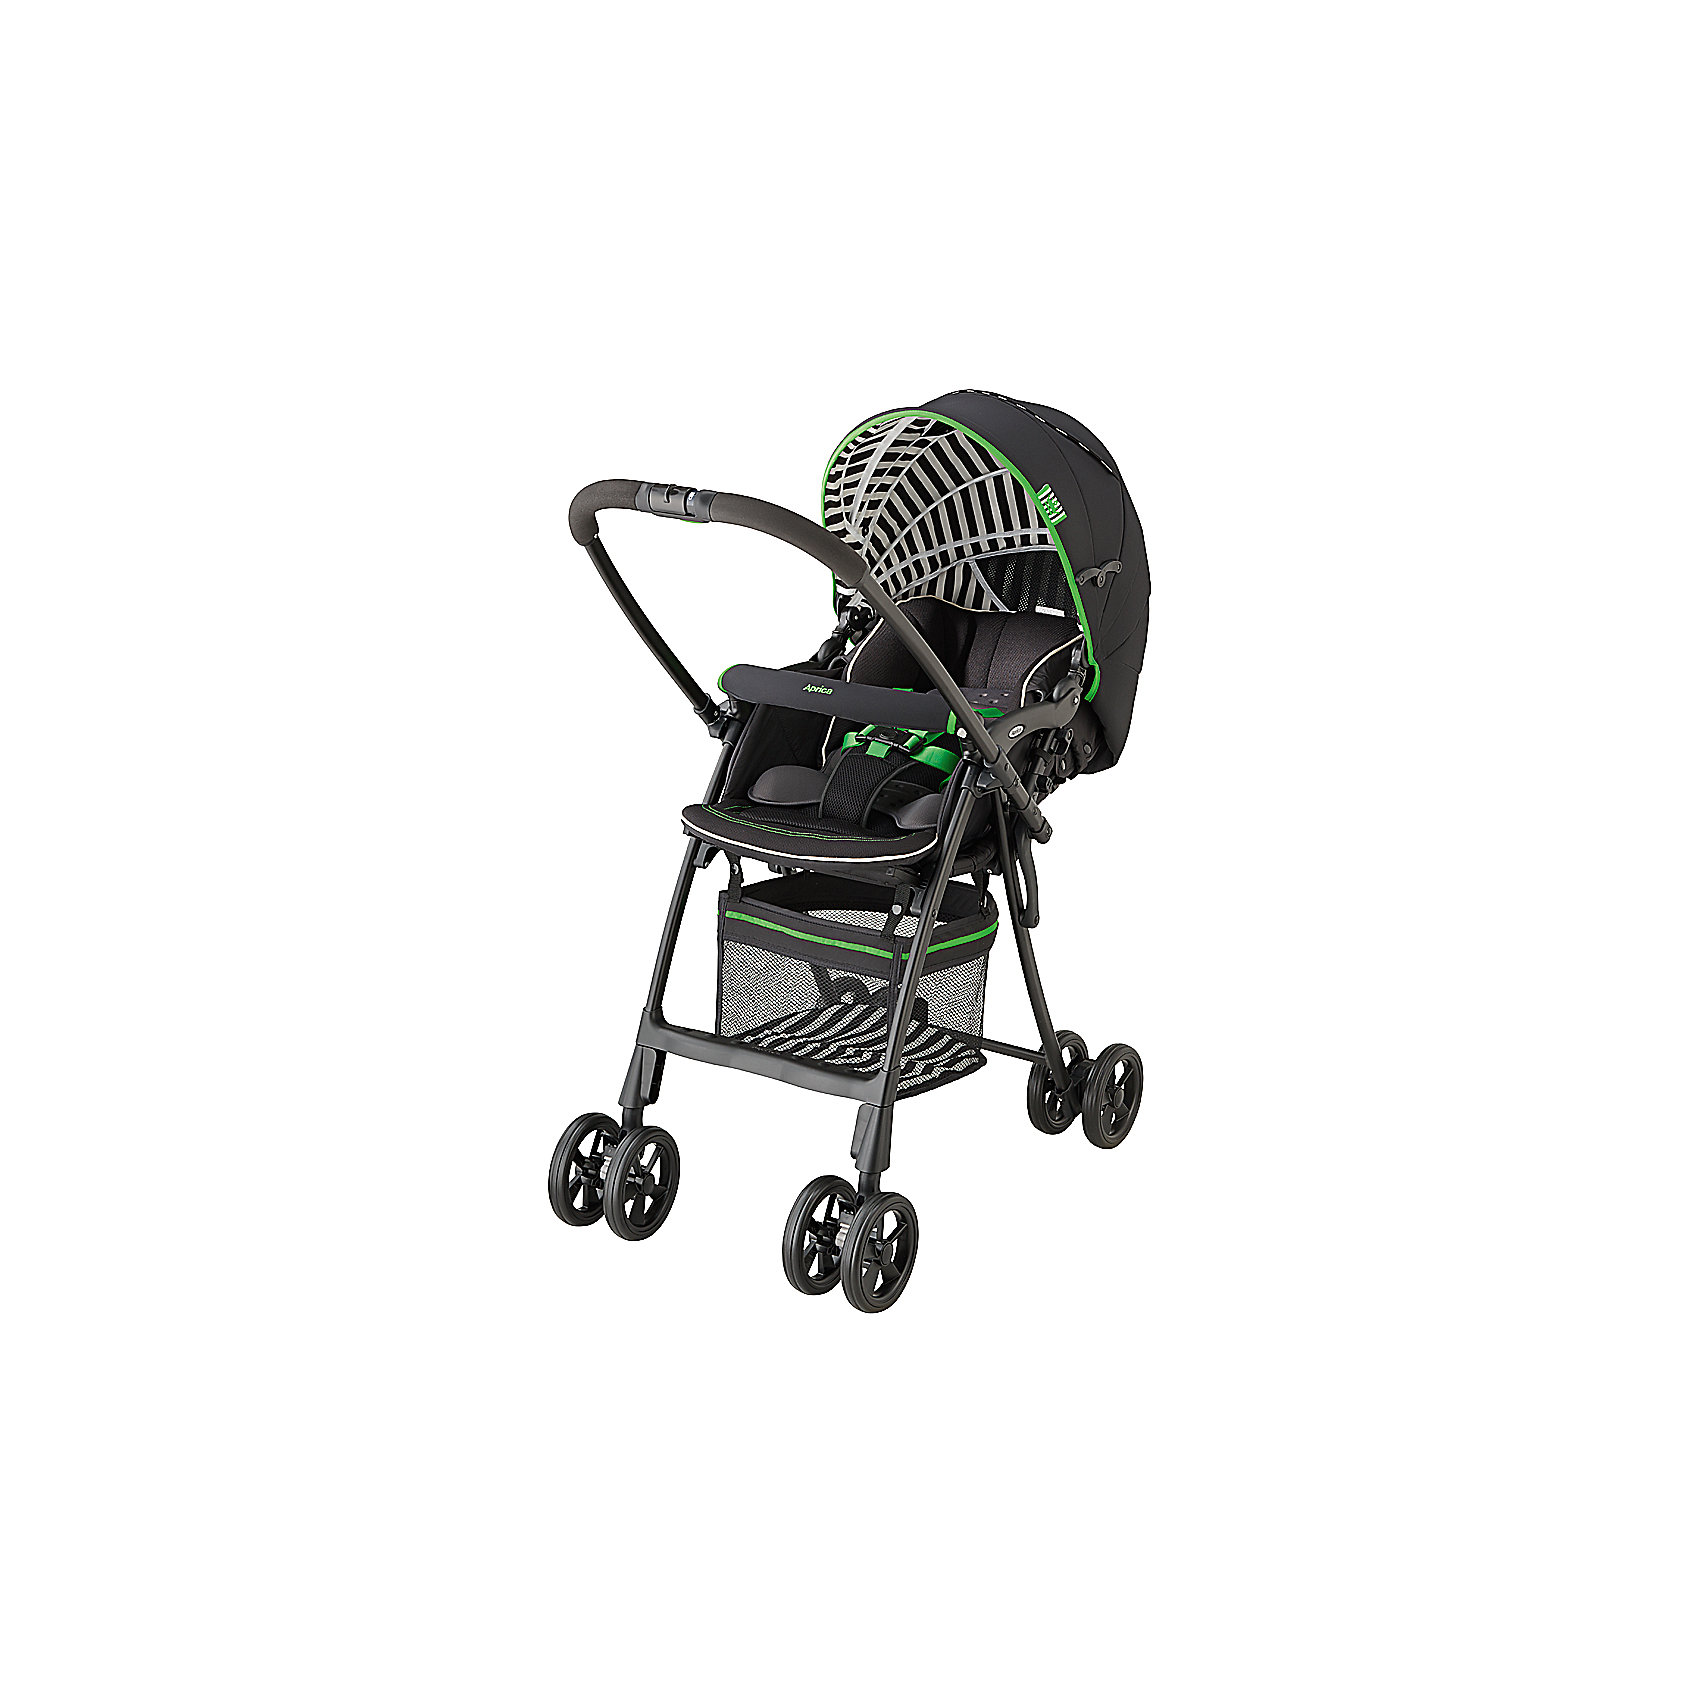 Aprica Прогулочная коляска FlyLe netro stripe, Aprica, прогулочные коляски aprica magical air